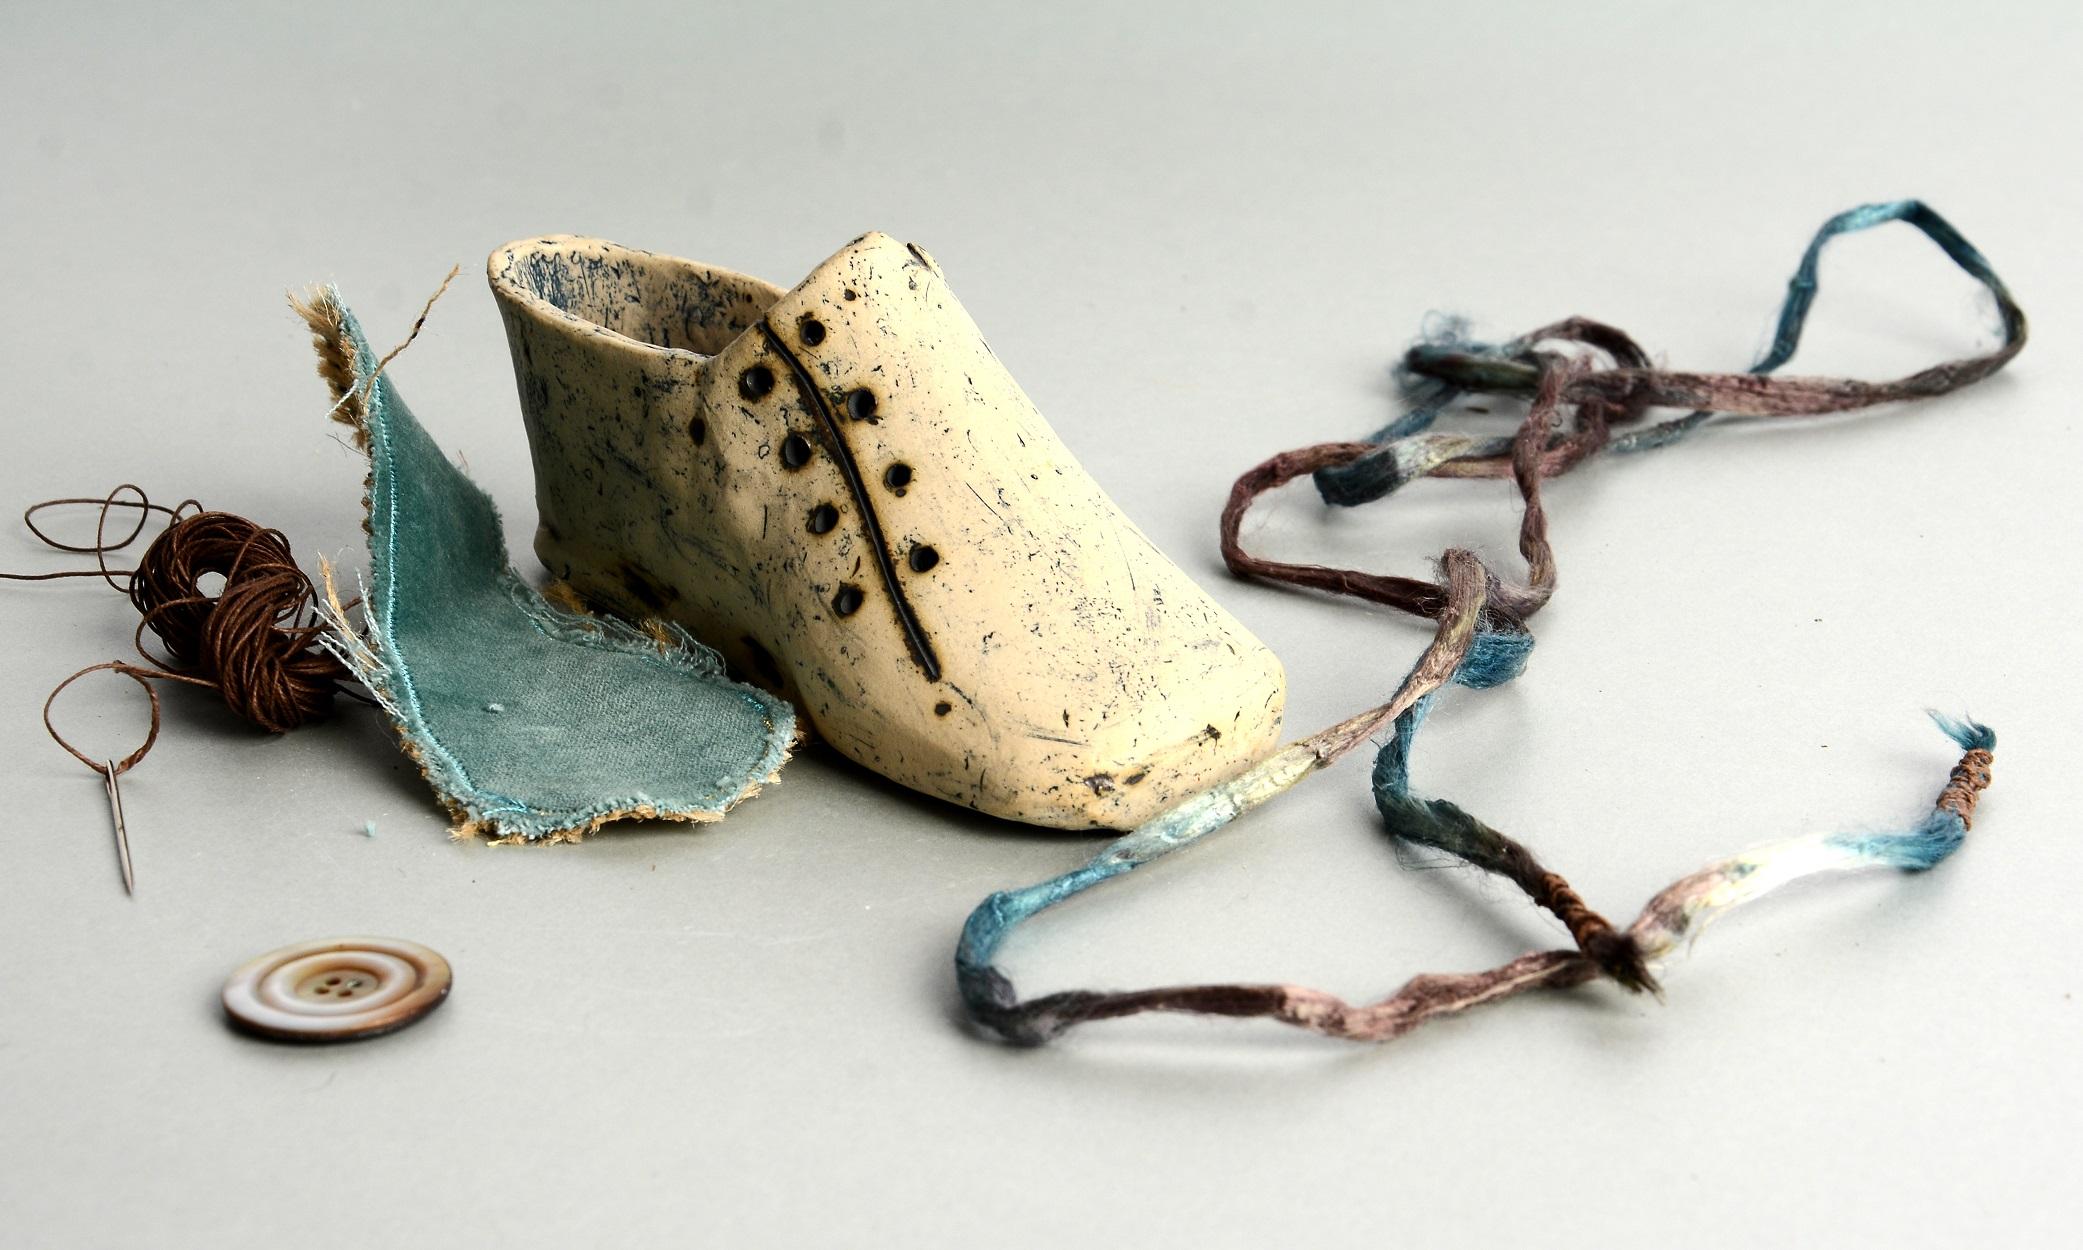 Ceramic, hessian, velvet, silk cord, nettle yarn, found objects. Approx. 15cm x 6 cm x 8cm